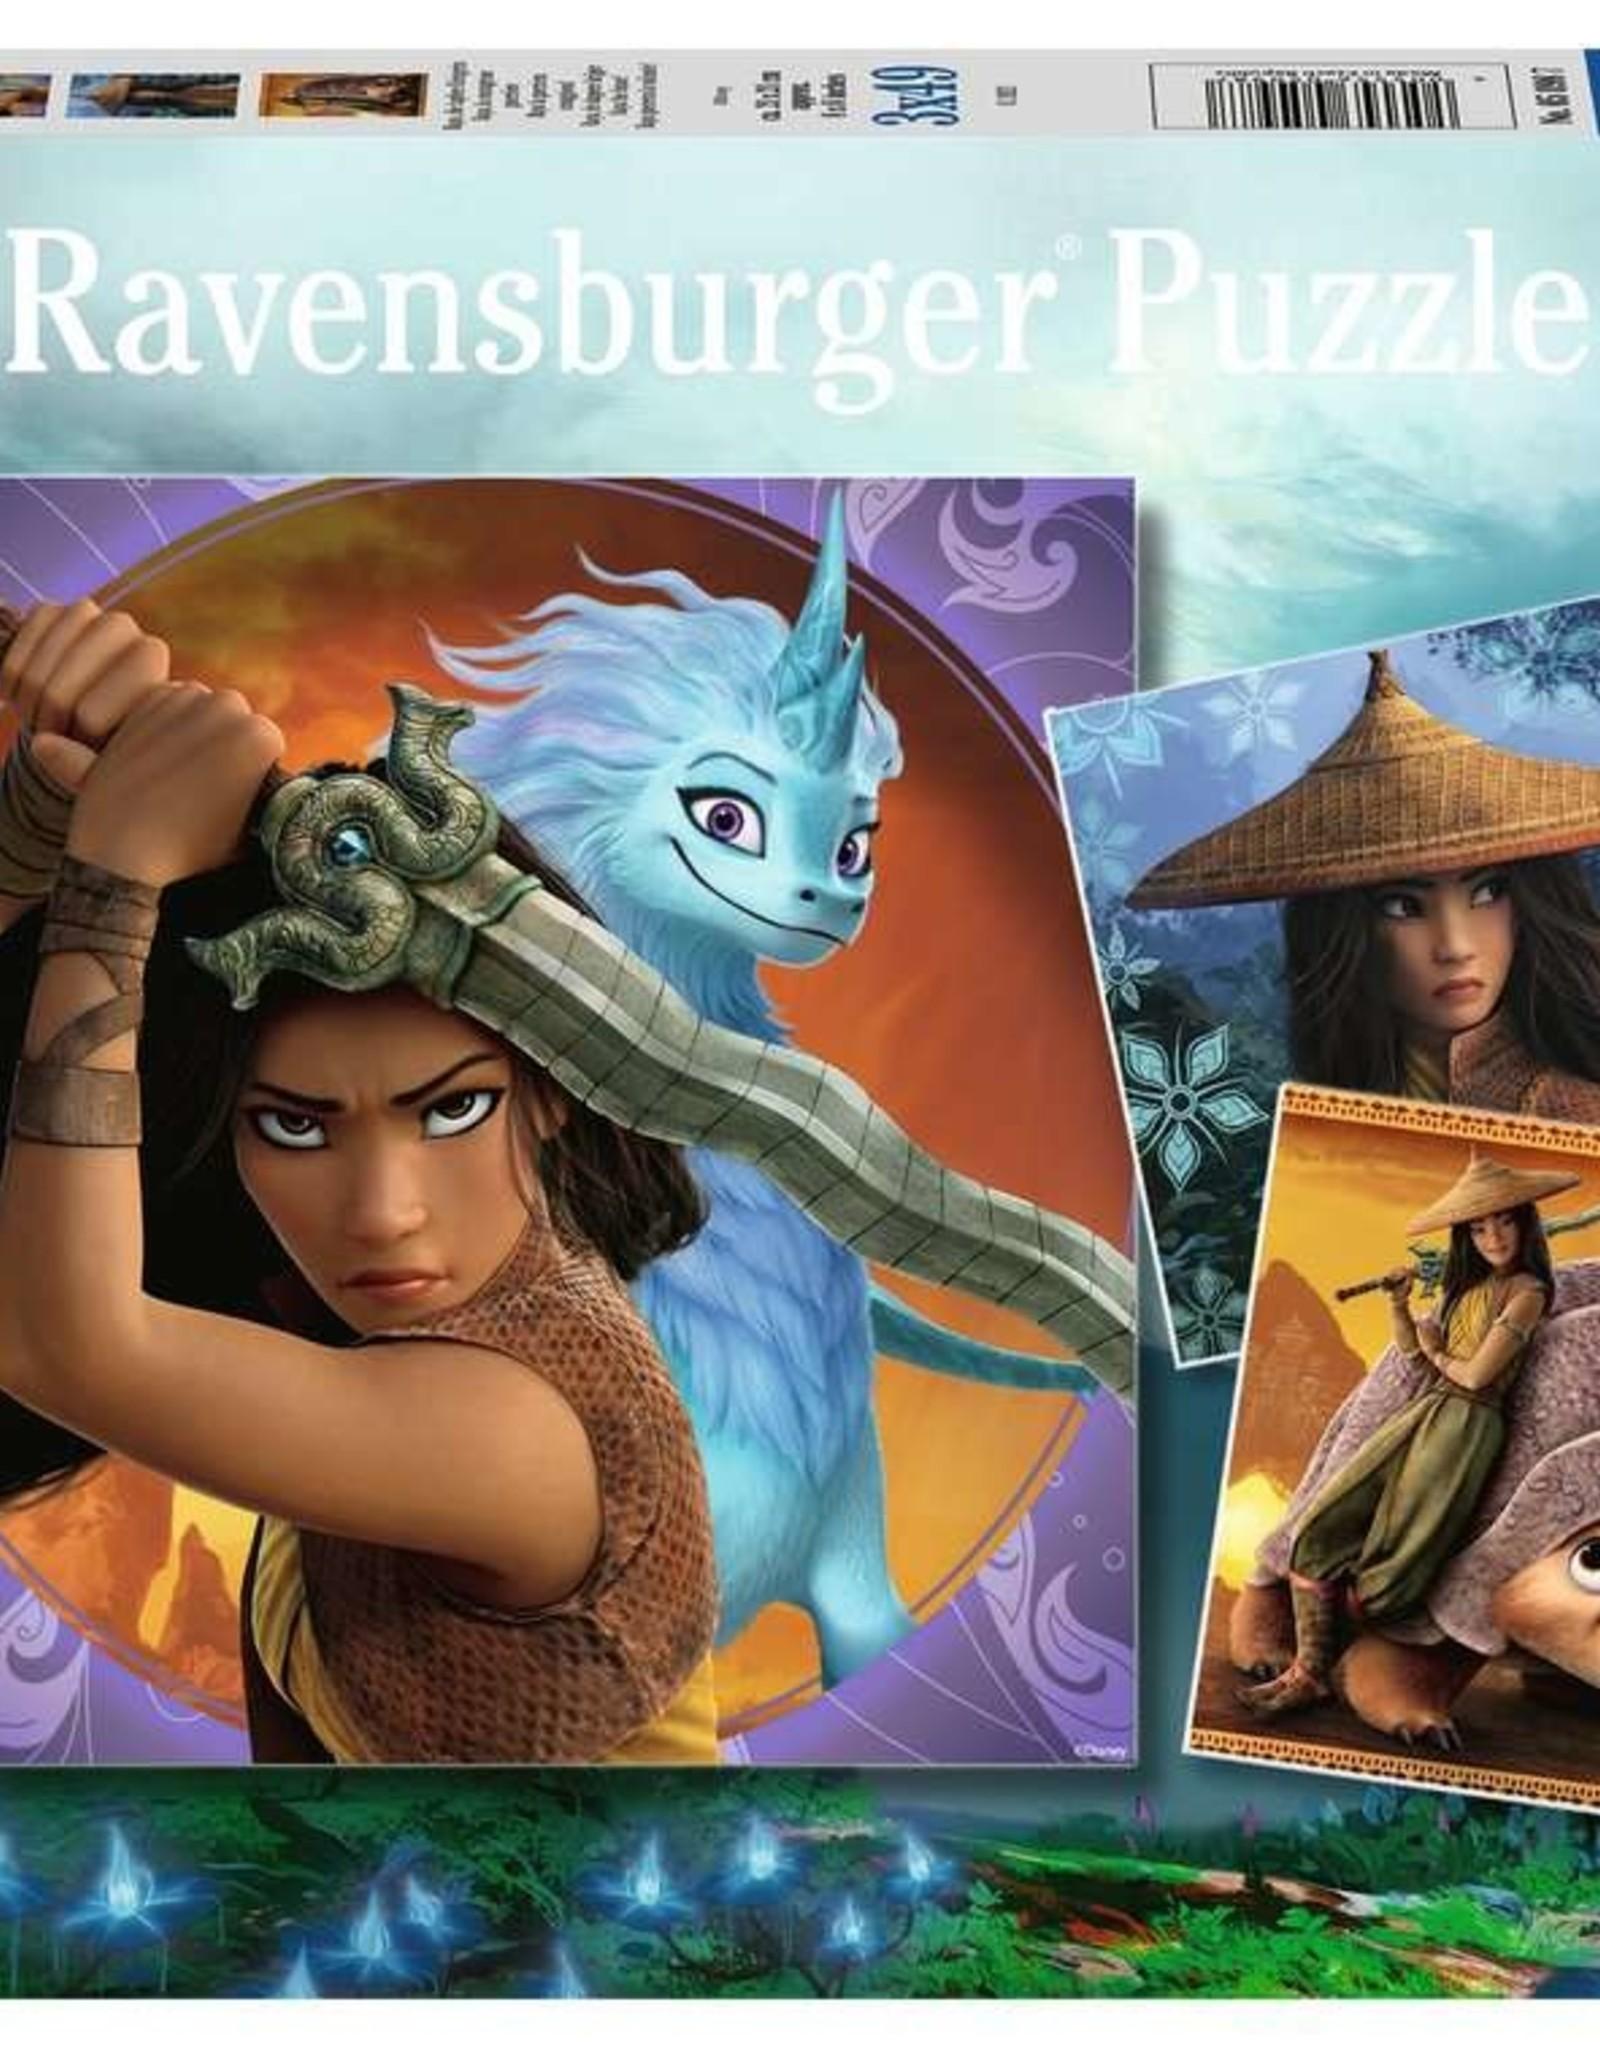 Ravensburger 3x49 Puzzle: Raya the Brave!